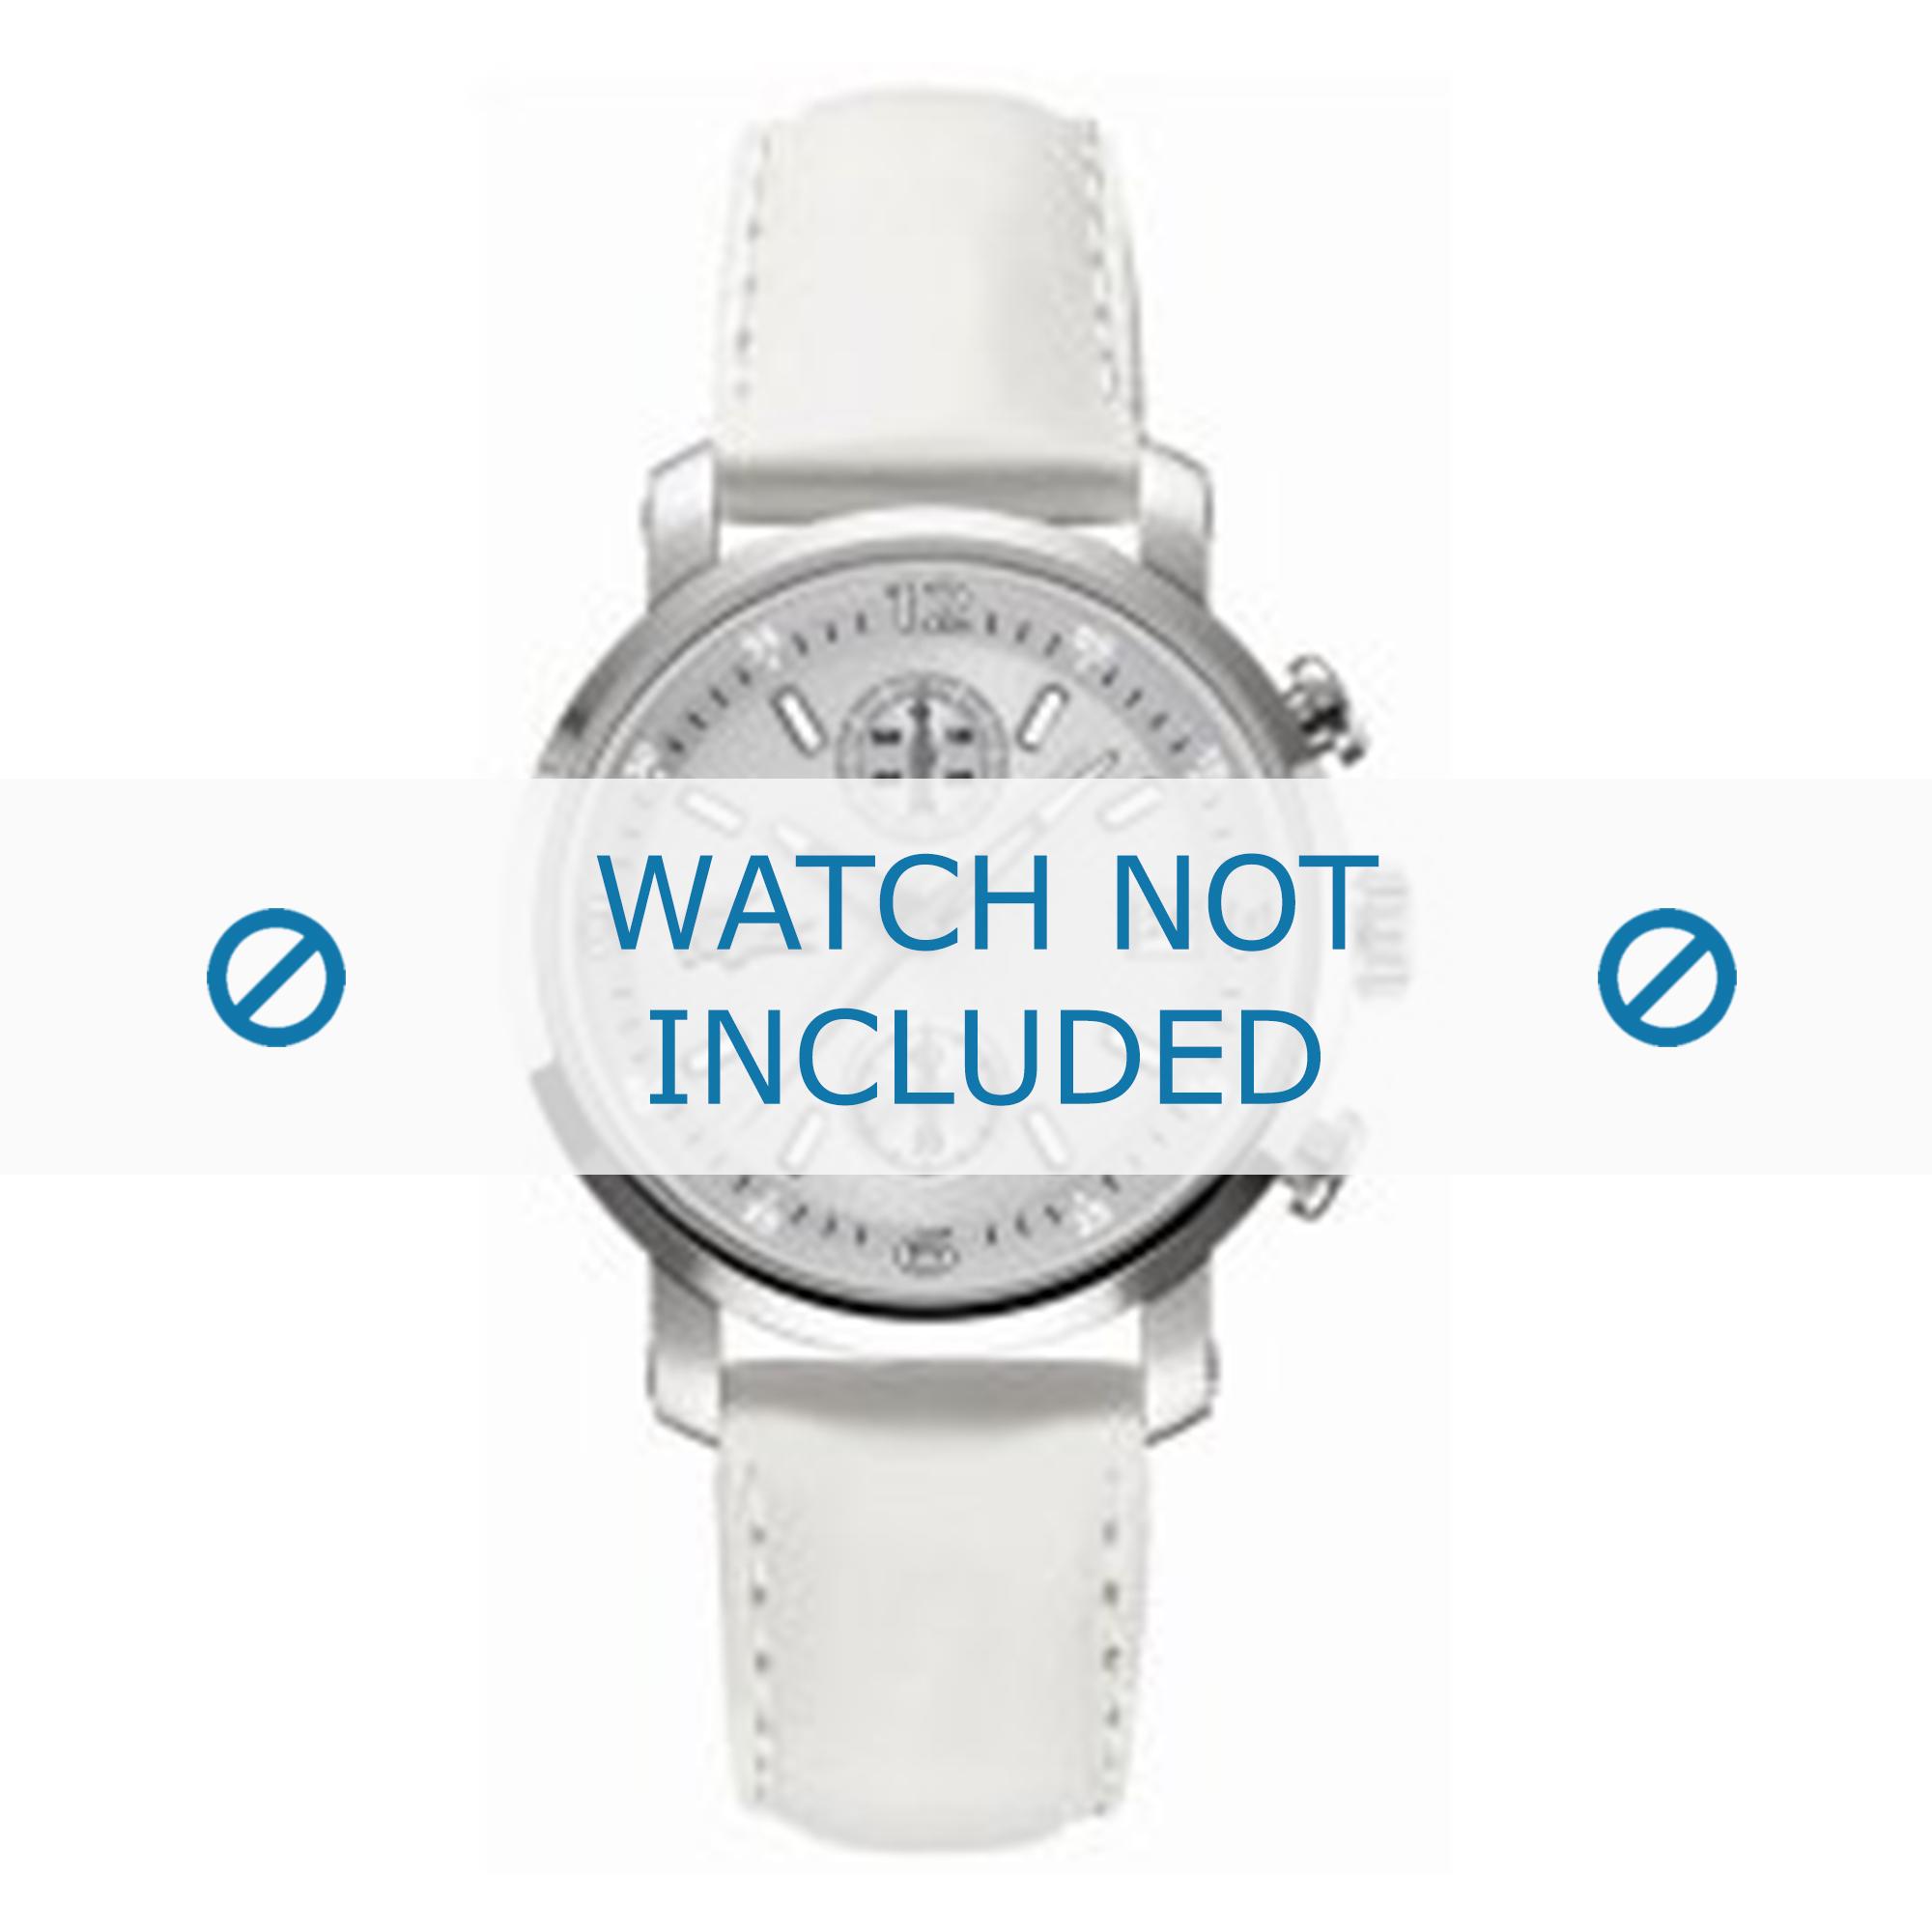 Lacoste horlogeband LC-12-3-14-0079 / 2000392 Leder Wit + wit stiksel